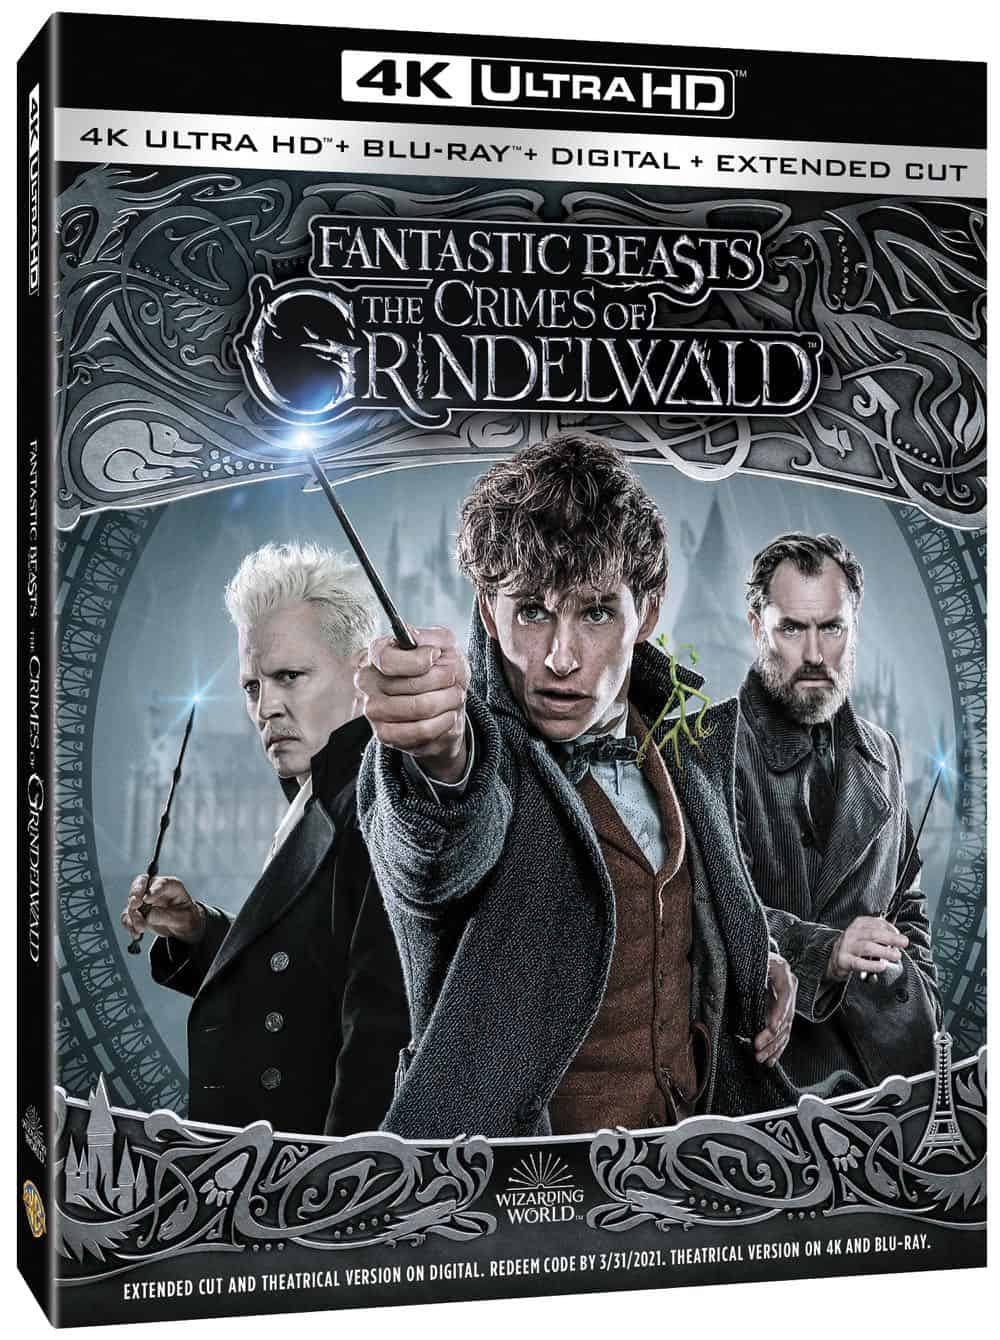 Fantastic Beasts The Crimes of Grindelwald 4K Bluray DVD Digital 2